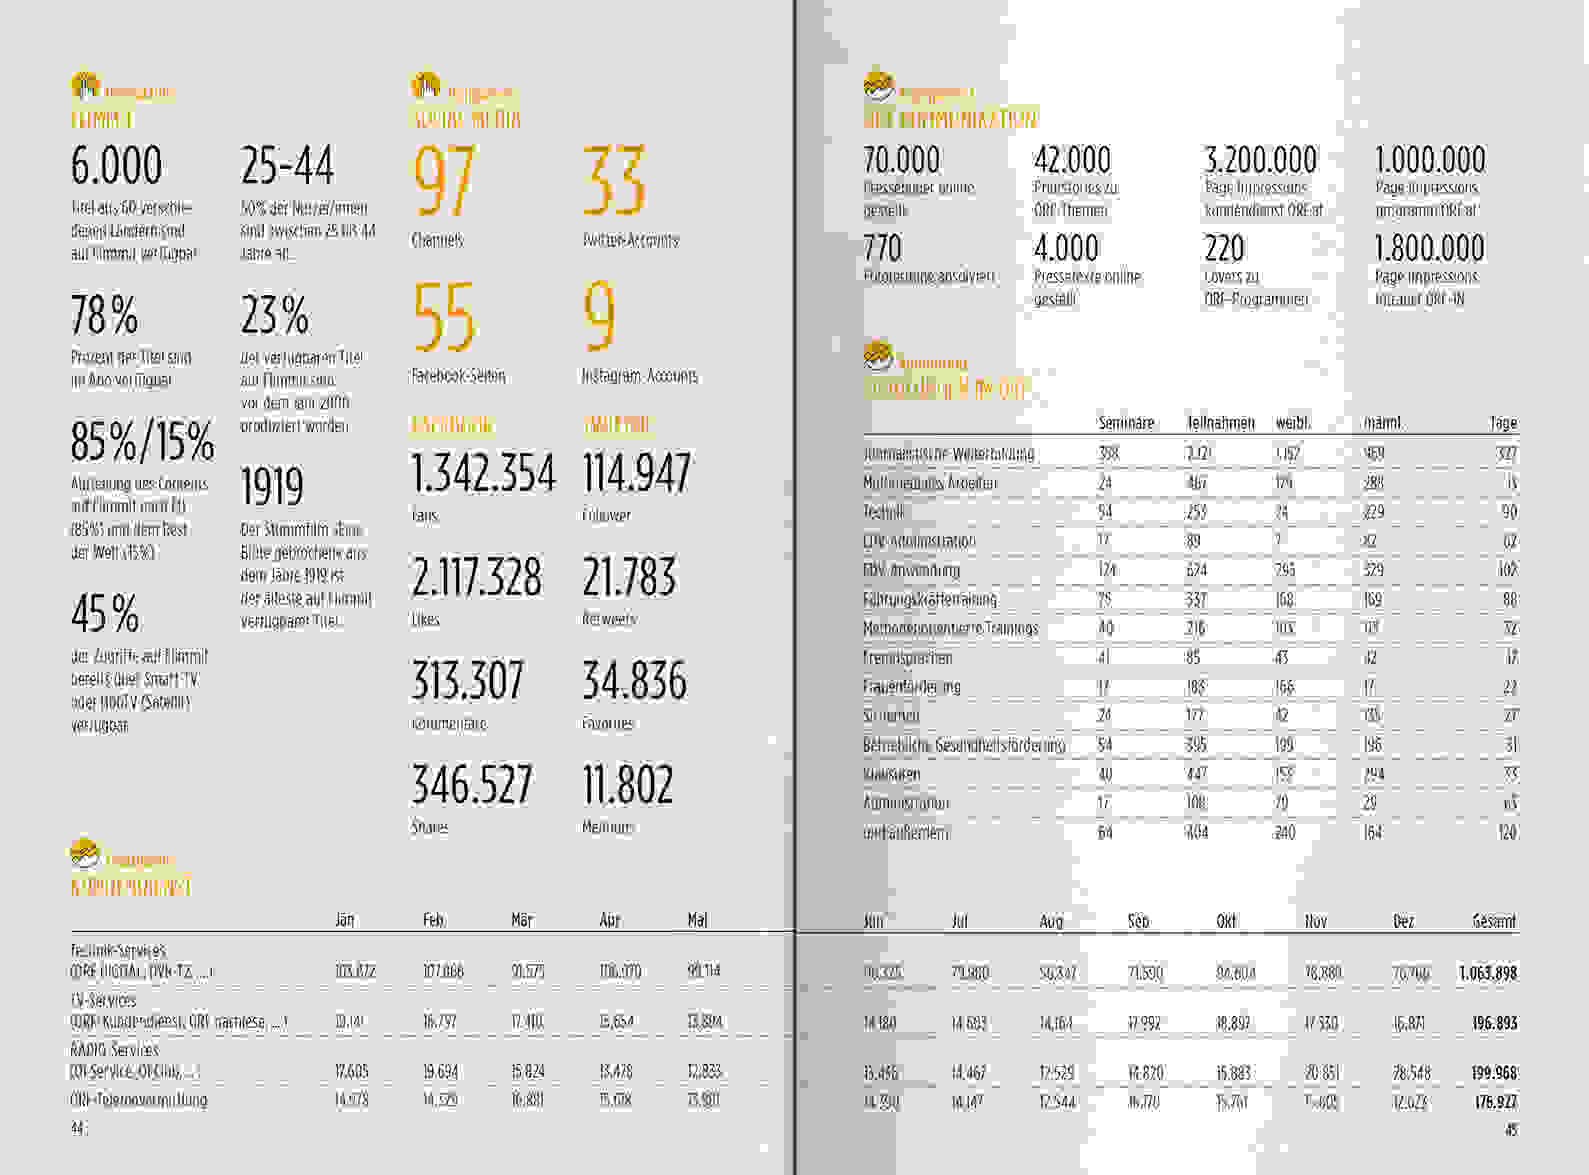 ORF PV 2016 Zahlen Slider Doppelseite 7